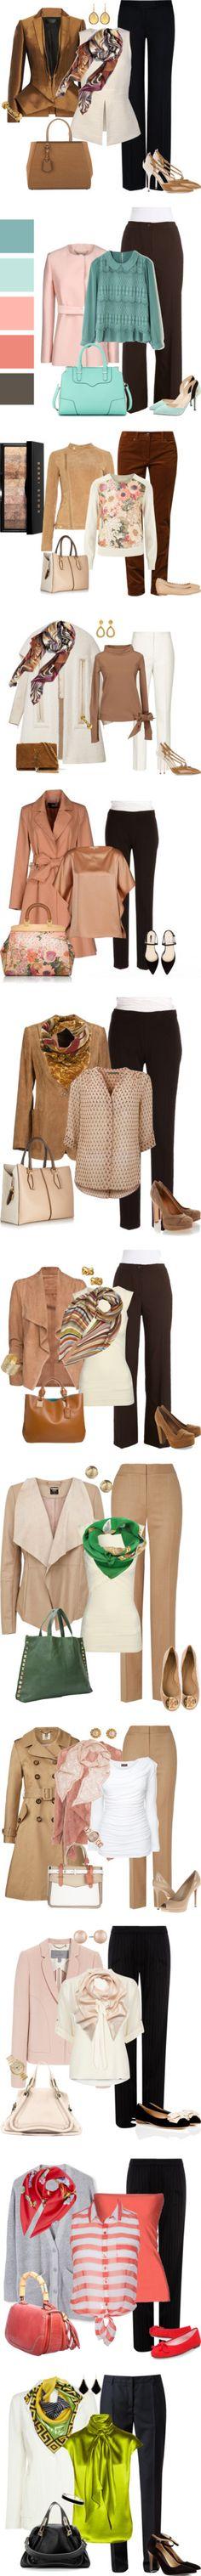 Chic pant outfits by binkie211 on Polyvore featuring мода, Haider Ackermann, STELLA McCARTNEY, Proenza Schouler, Nordstrom, Dolce&Gabbana, Fendi, Valentino, Jones New York and Boohoo